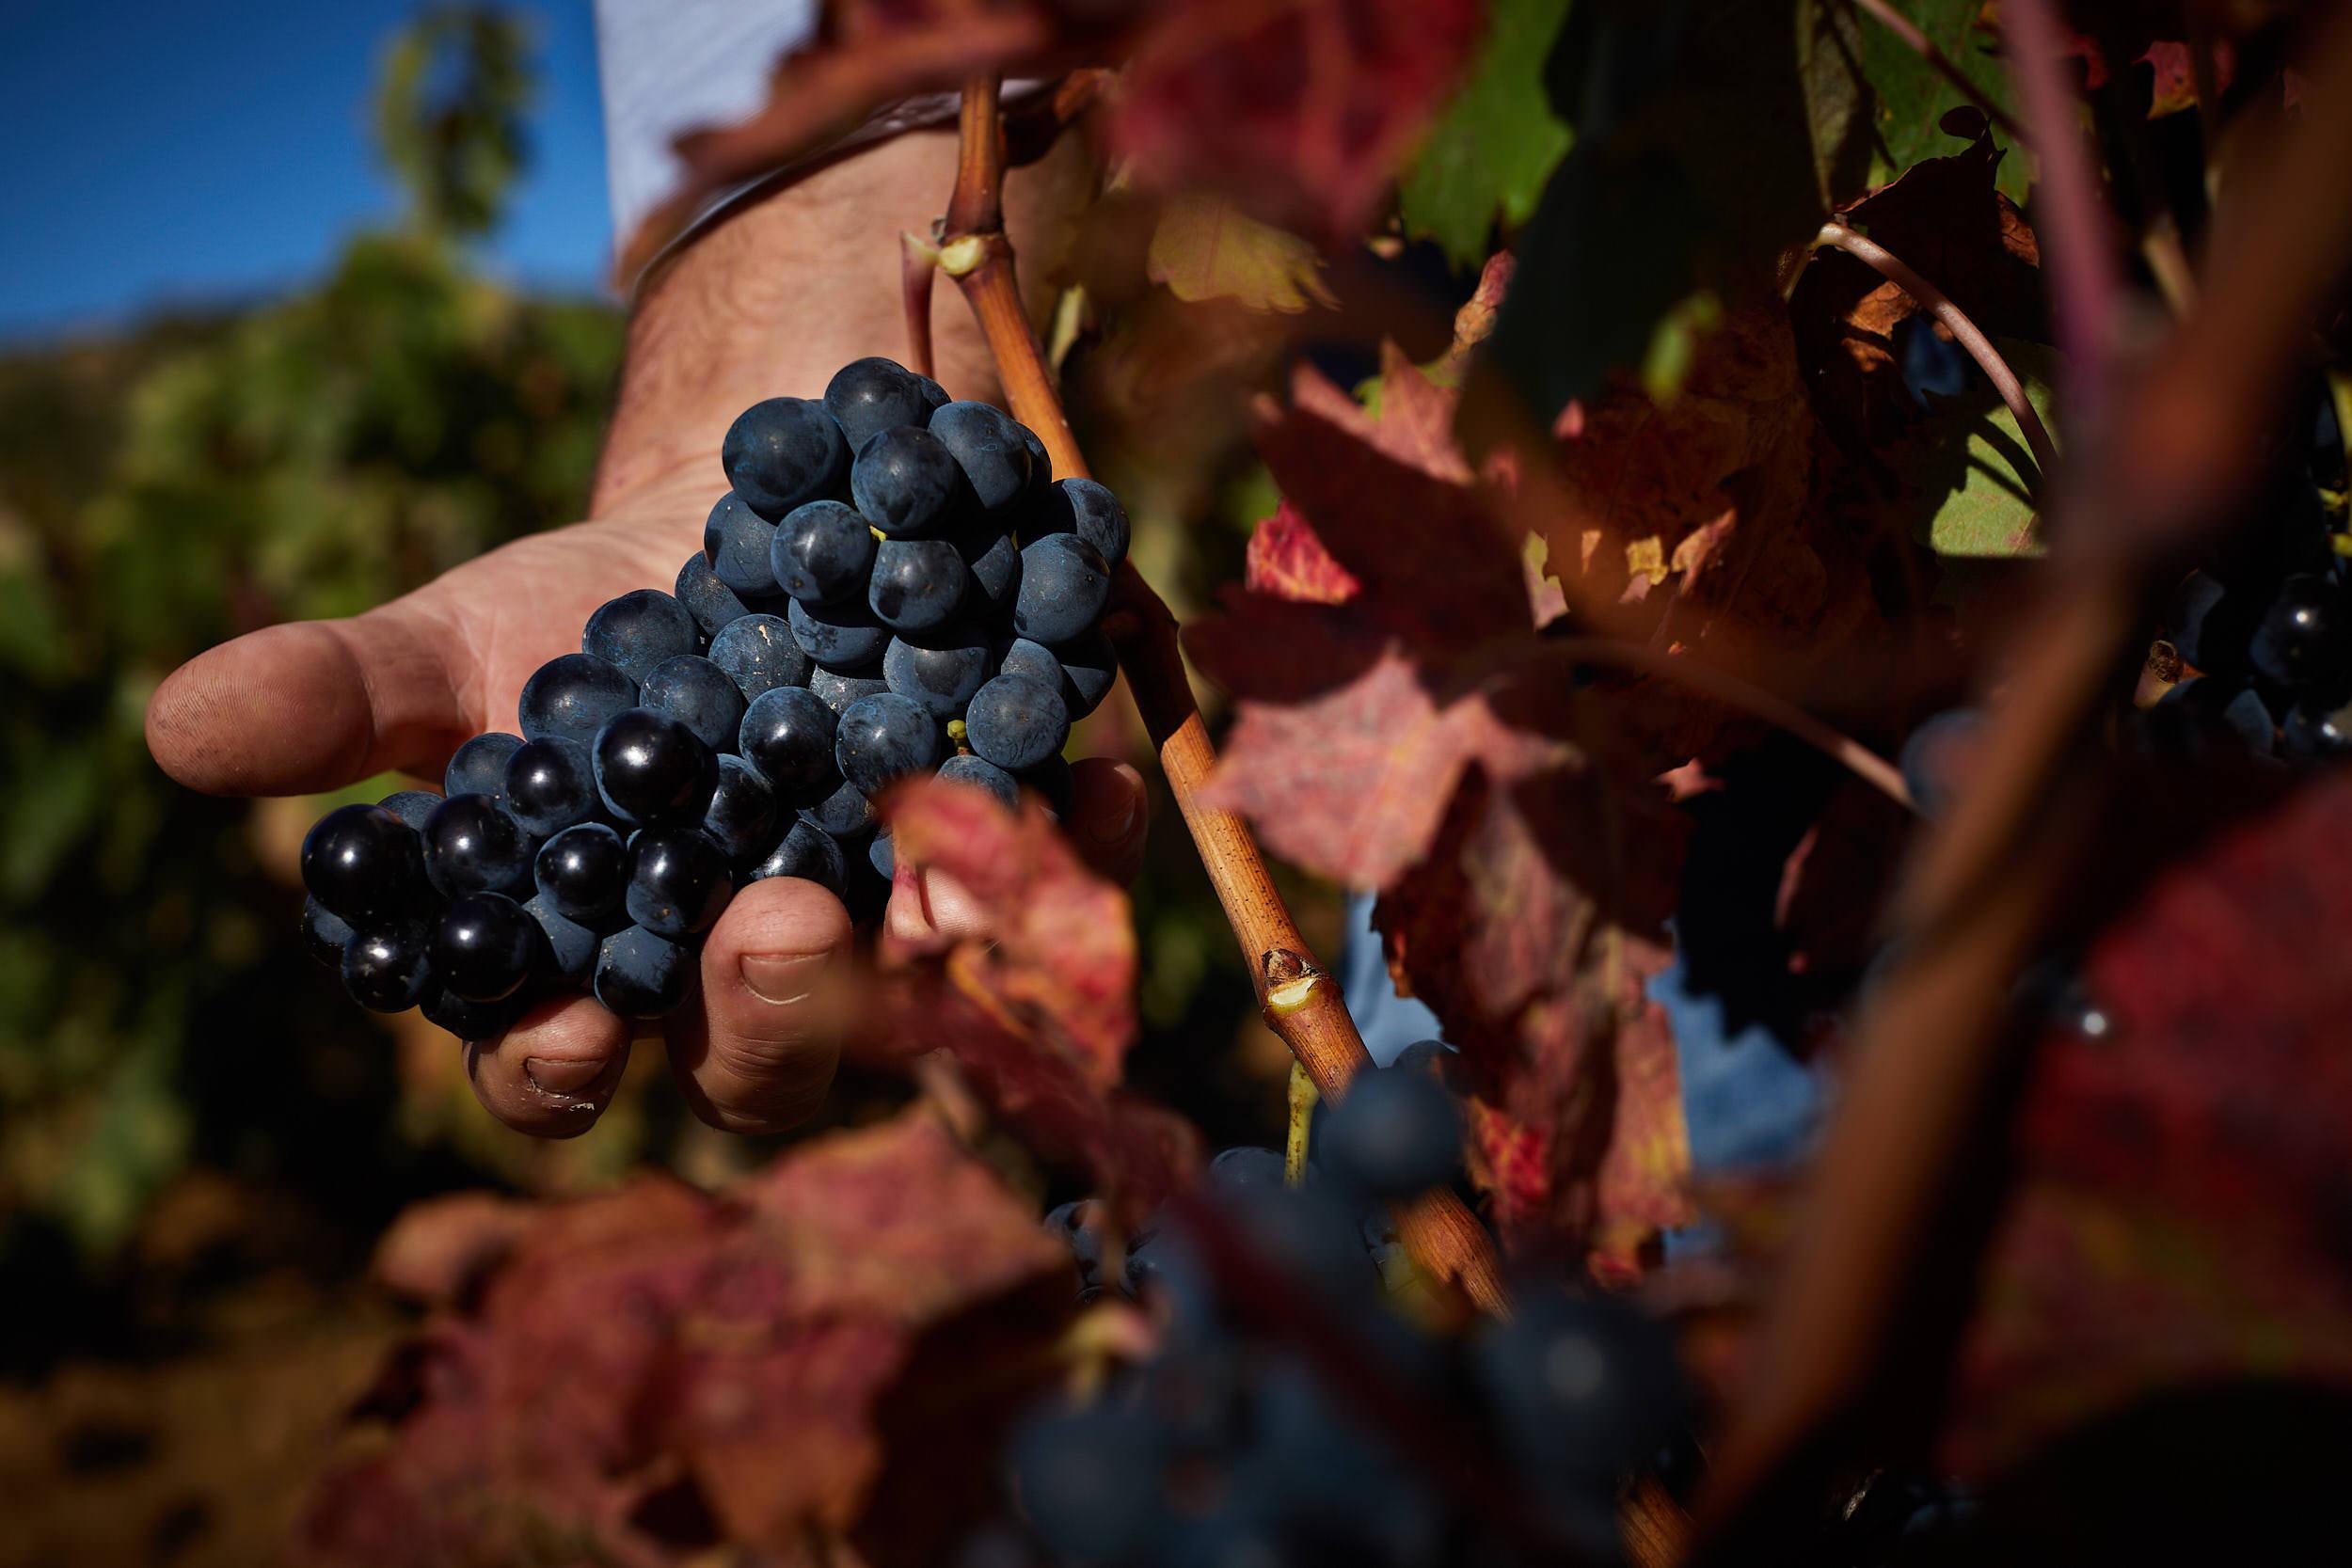 1810fotografia-profesional-corporativa-vino-rioja-espana-James-Sturcke_0041.jpg